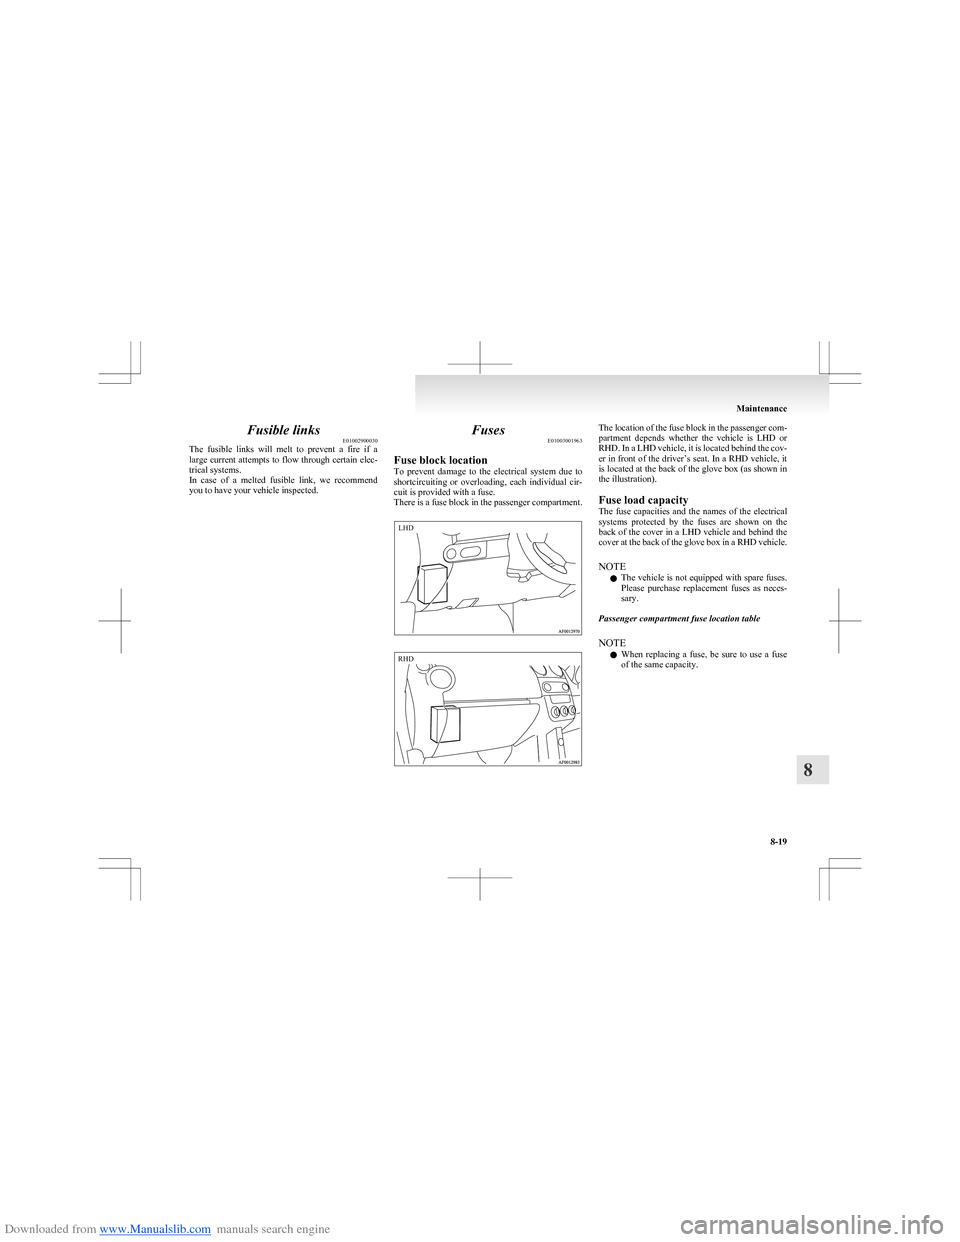 Colt Fuse Box Location Detailed Schematics Diagram 2009 Mitsubishi Outlander 10 G Owners Manual Fuel Pump Control Module